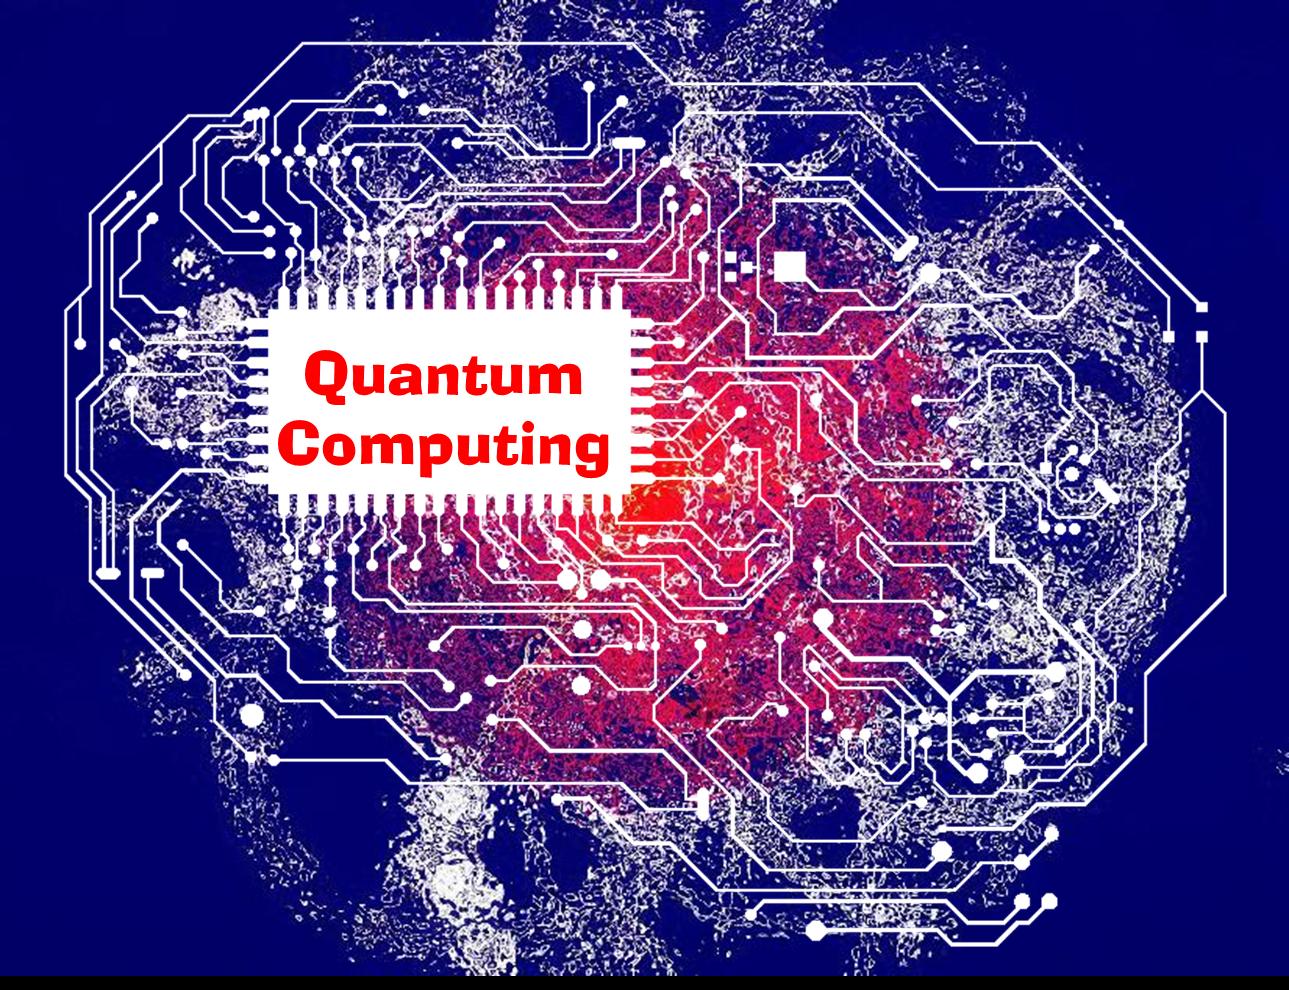 Aussie scientists develop world-first blueprint for large scale quantum computer